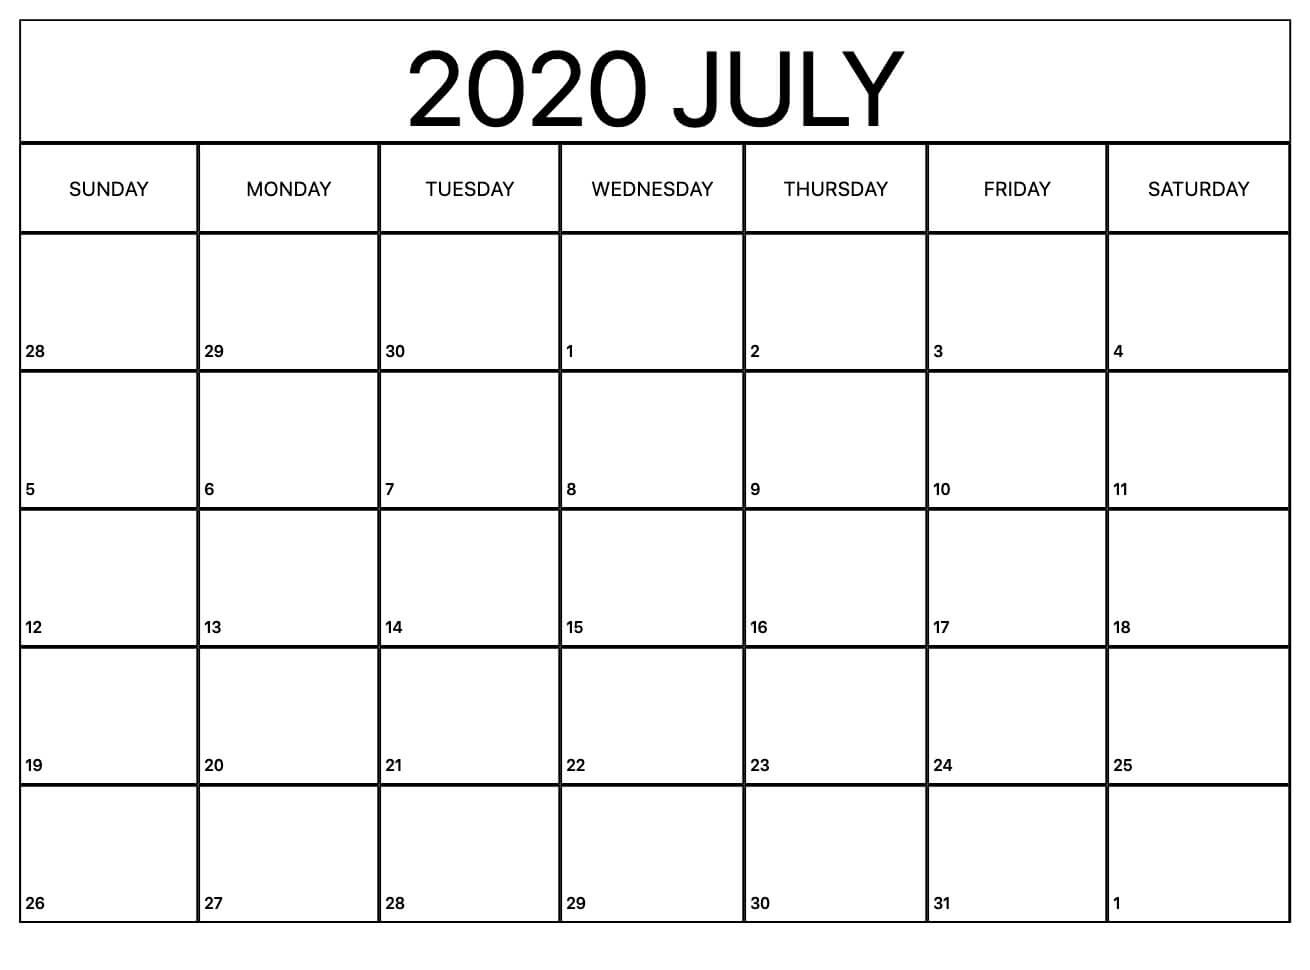 July 2020 Calendar Printable Floral